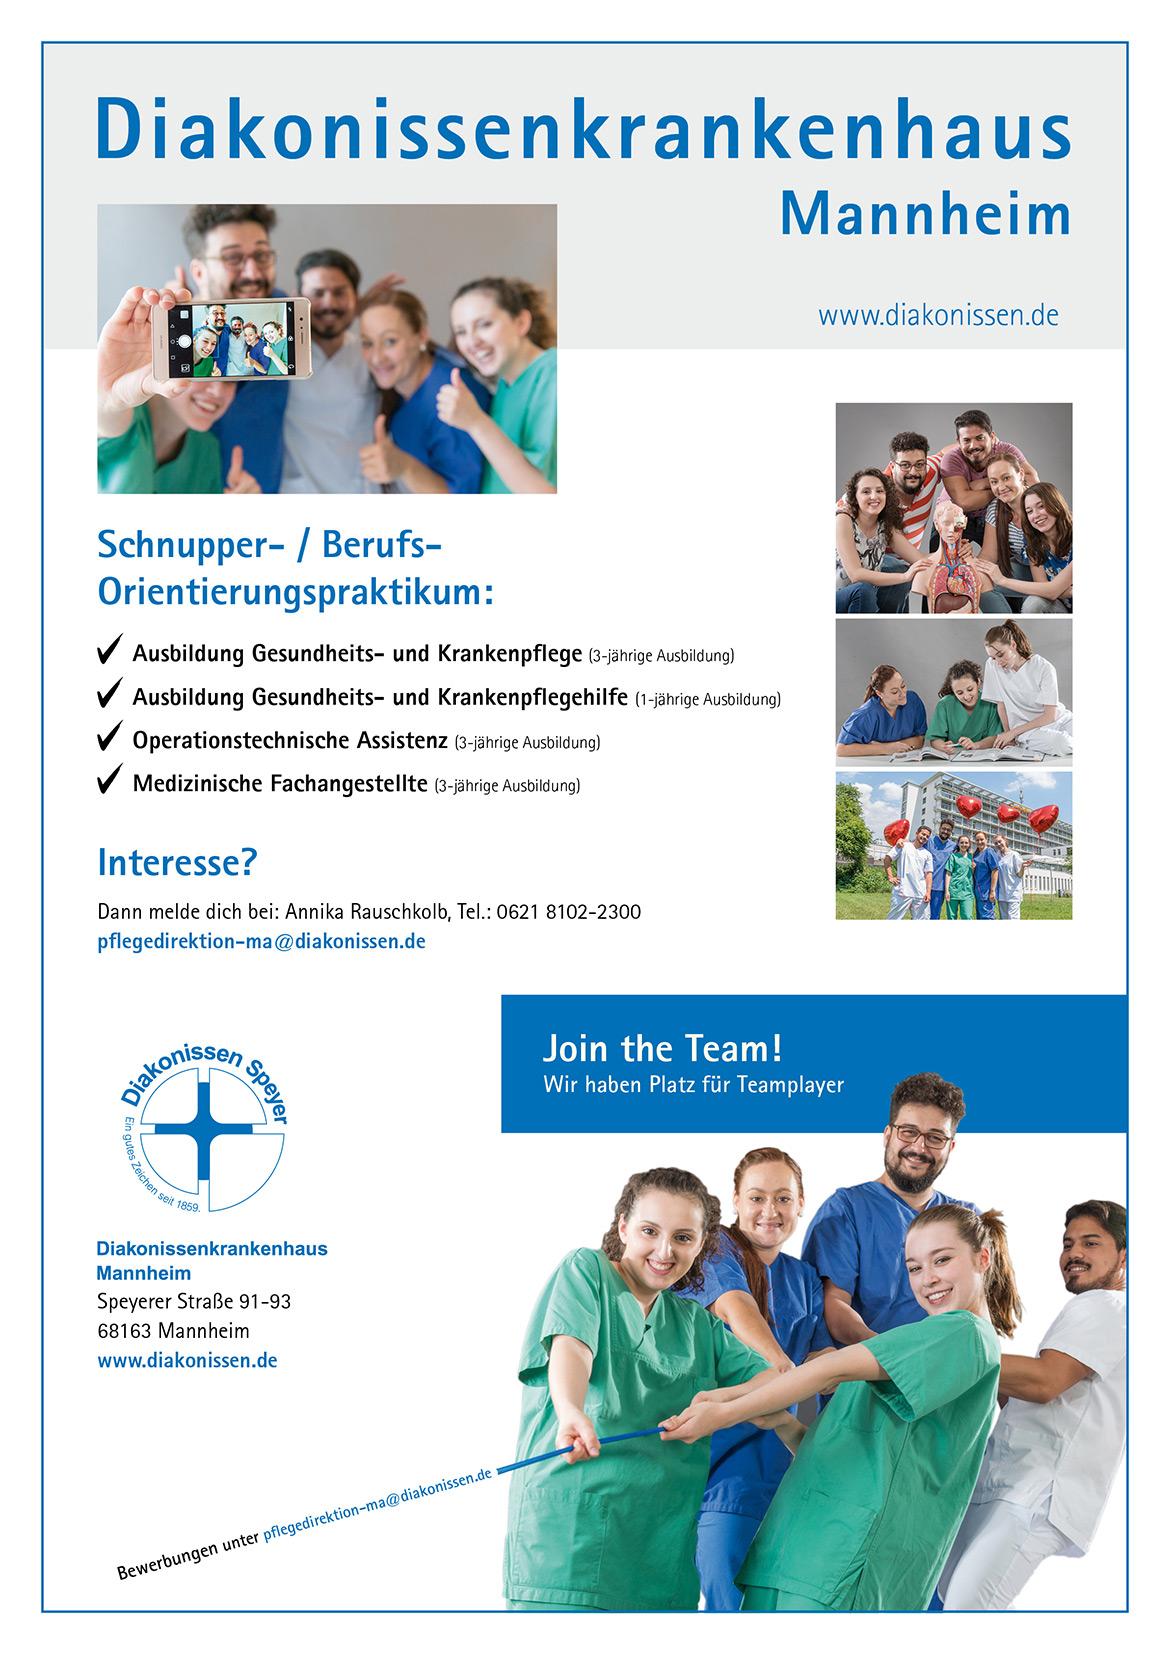 Ausbildungsplakat: Diakonissenkrankenhaus Mannheim